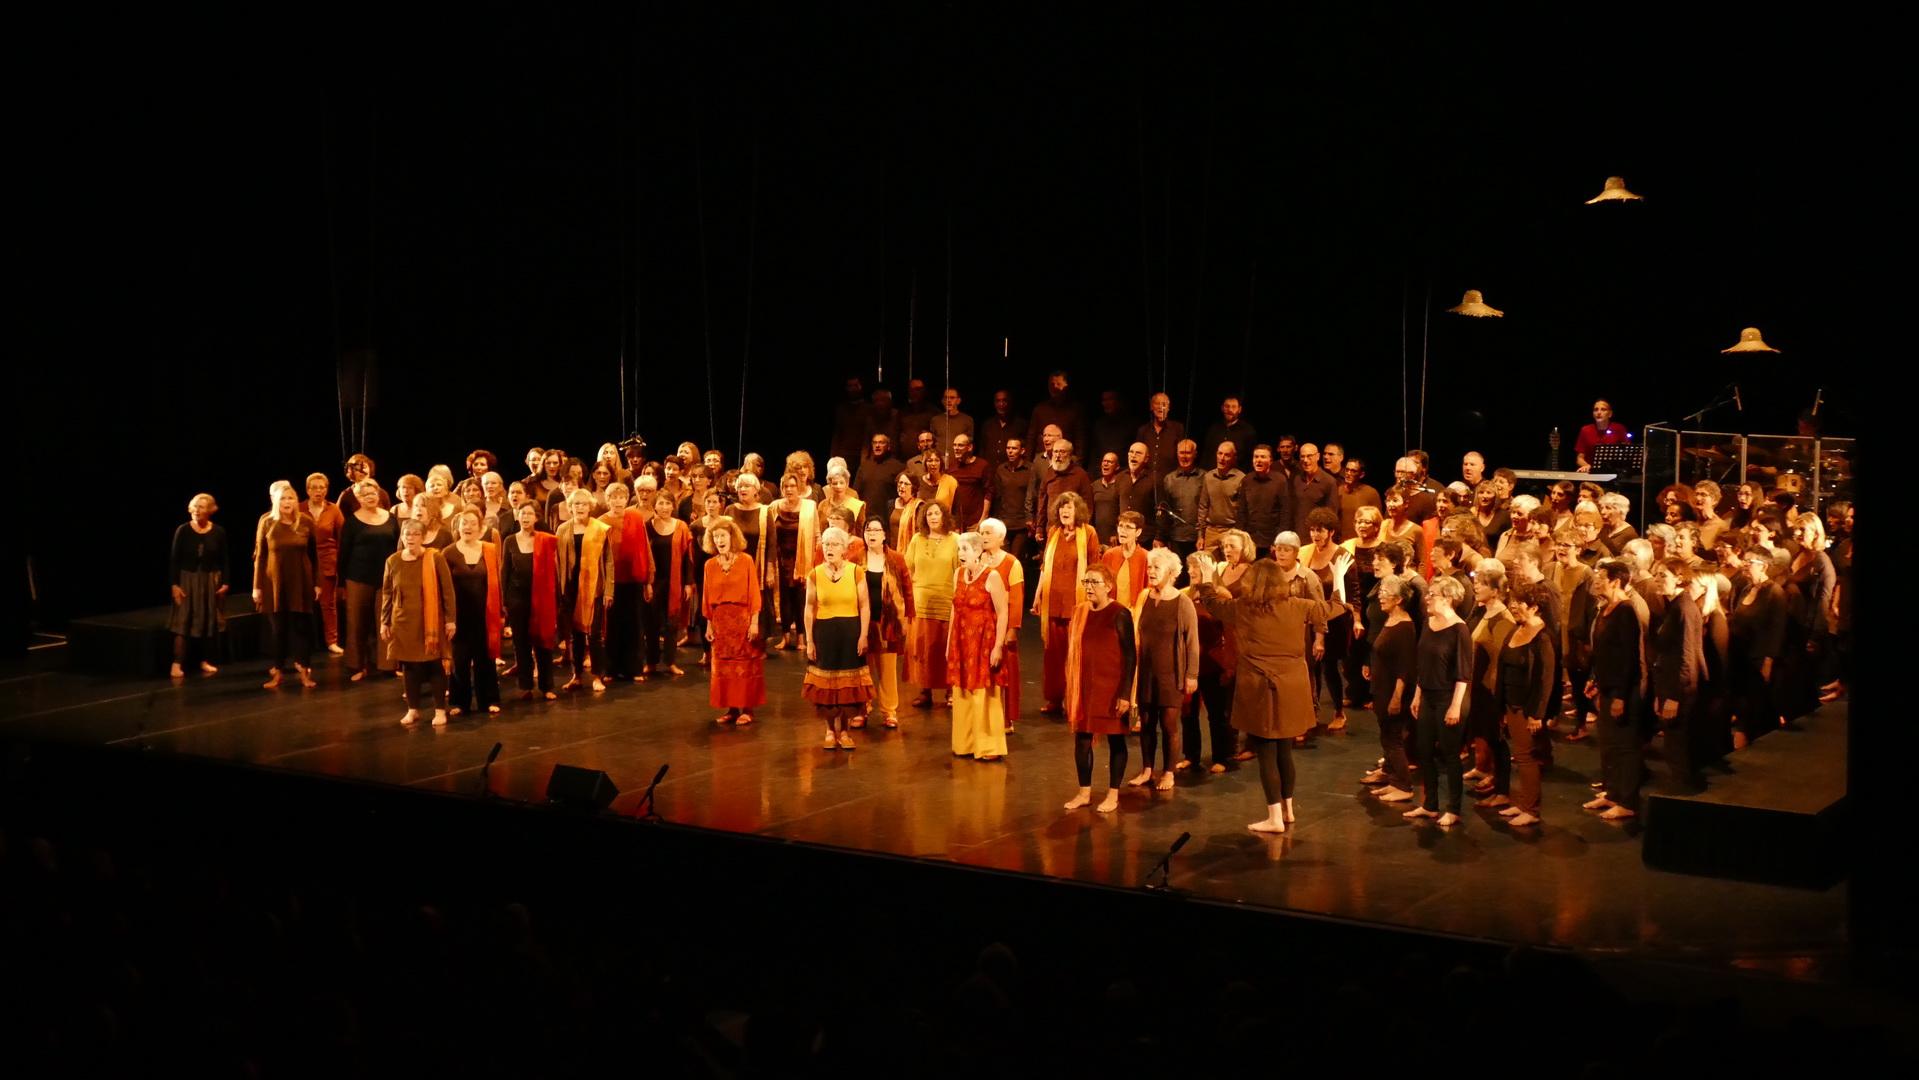 LFDS_concert_ailleurs (54)